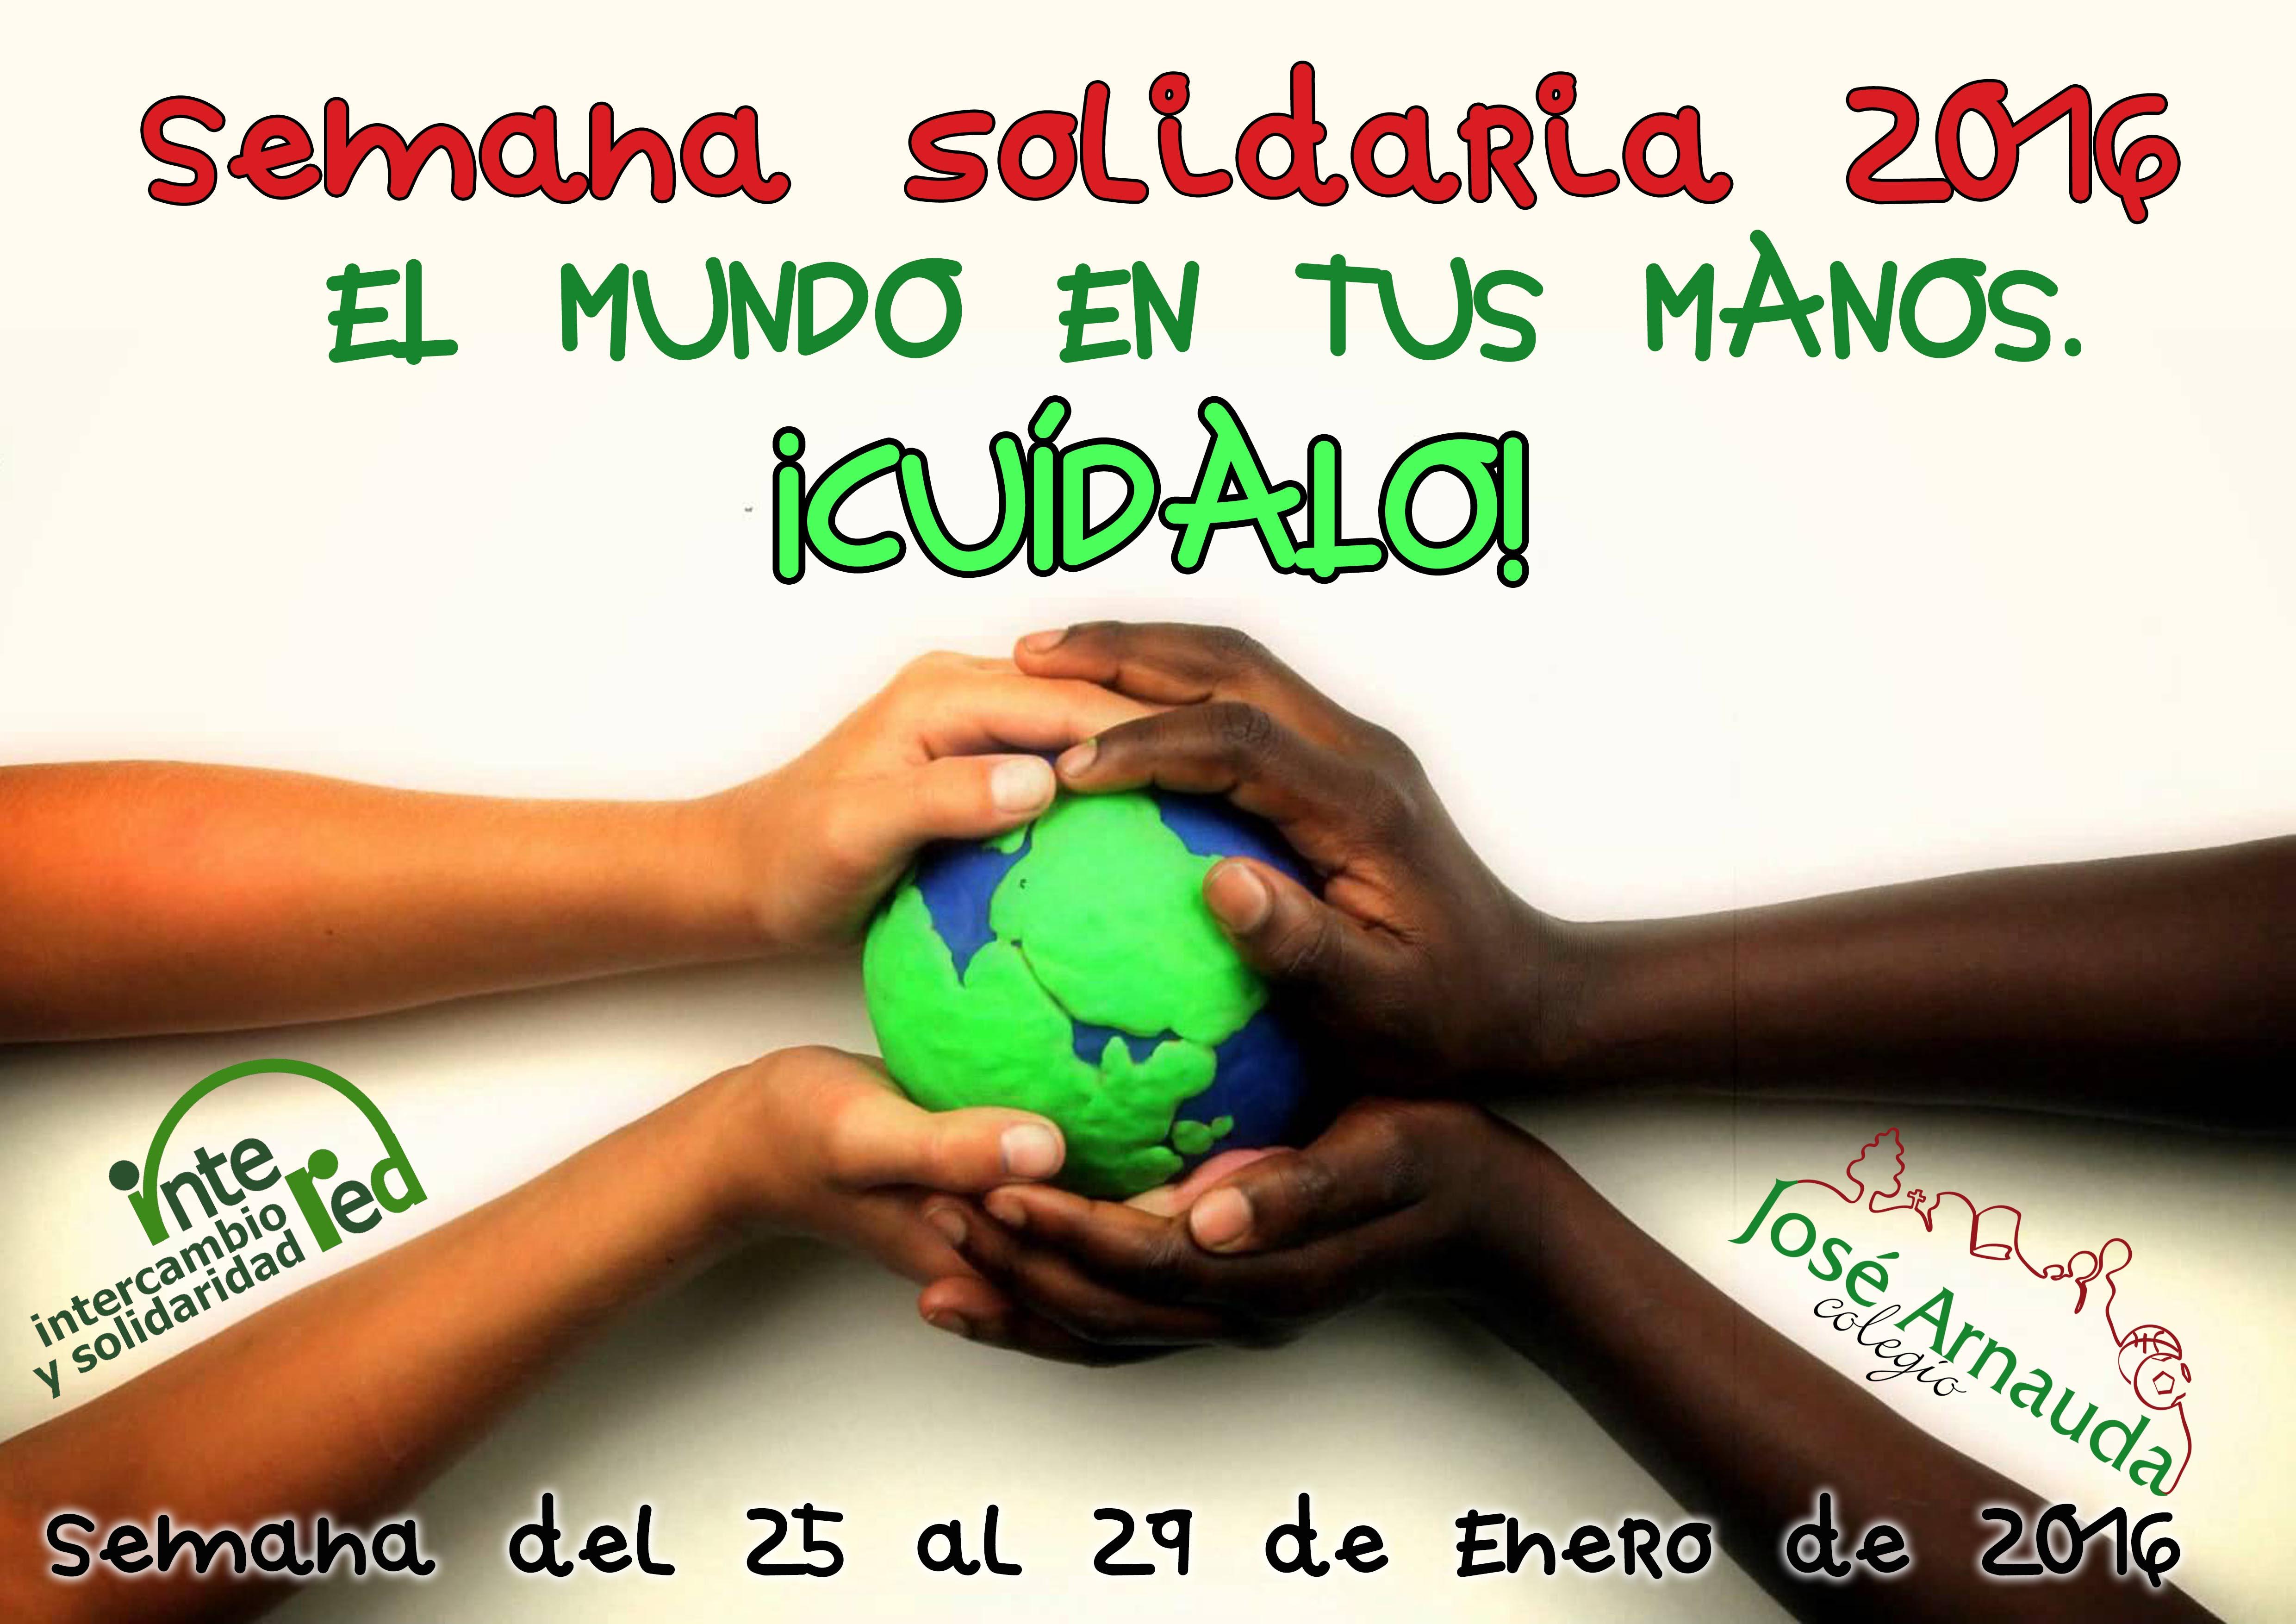 Semana Solidaria 2016